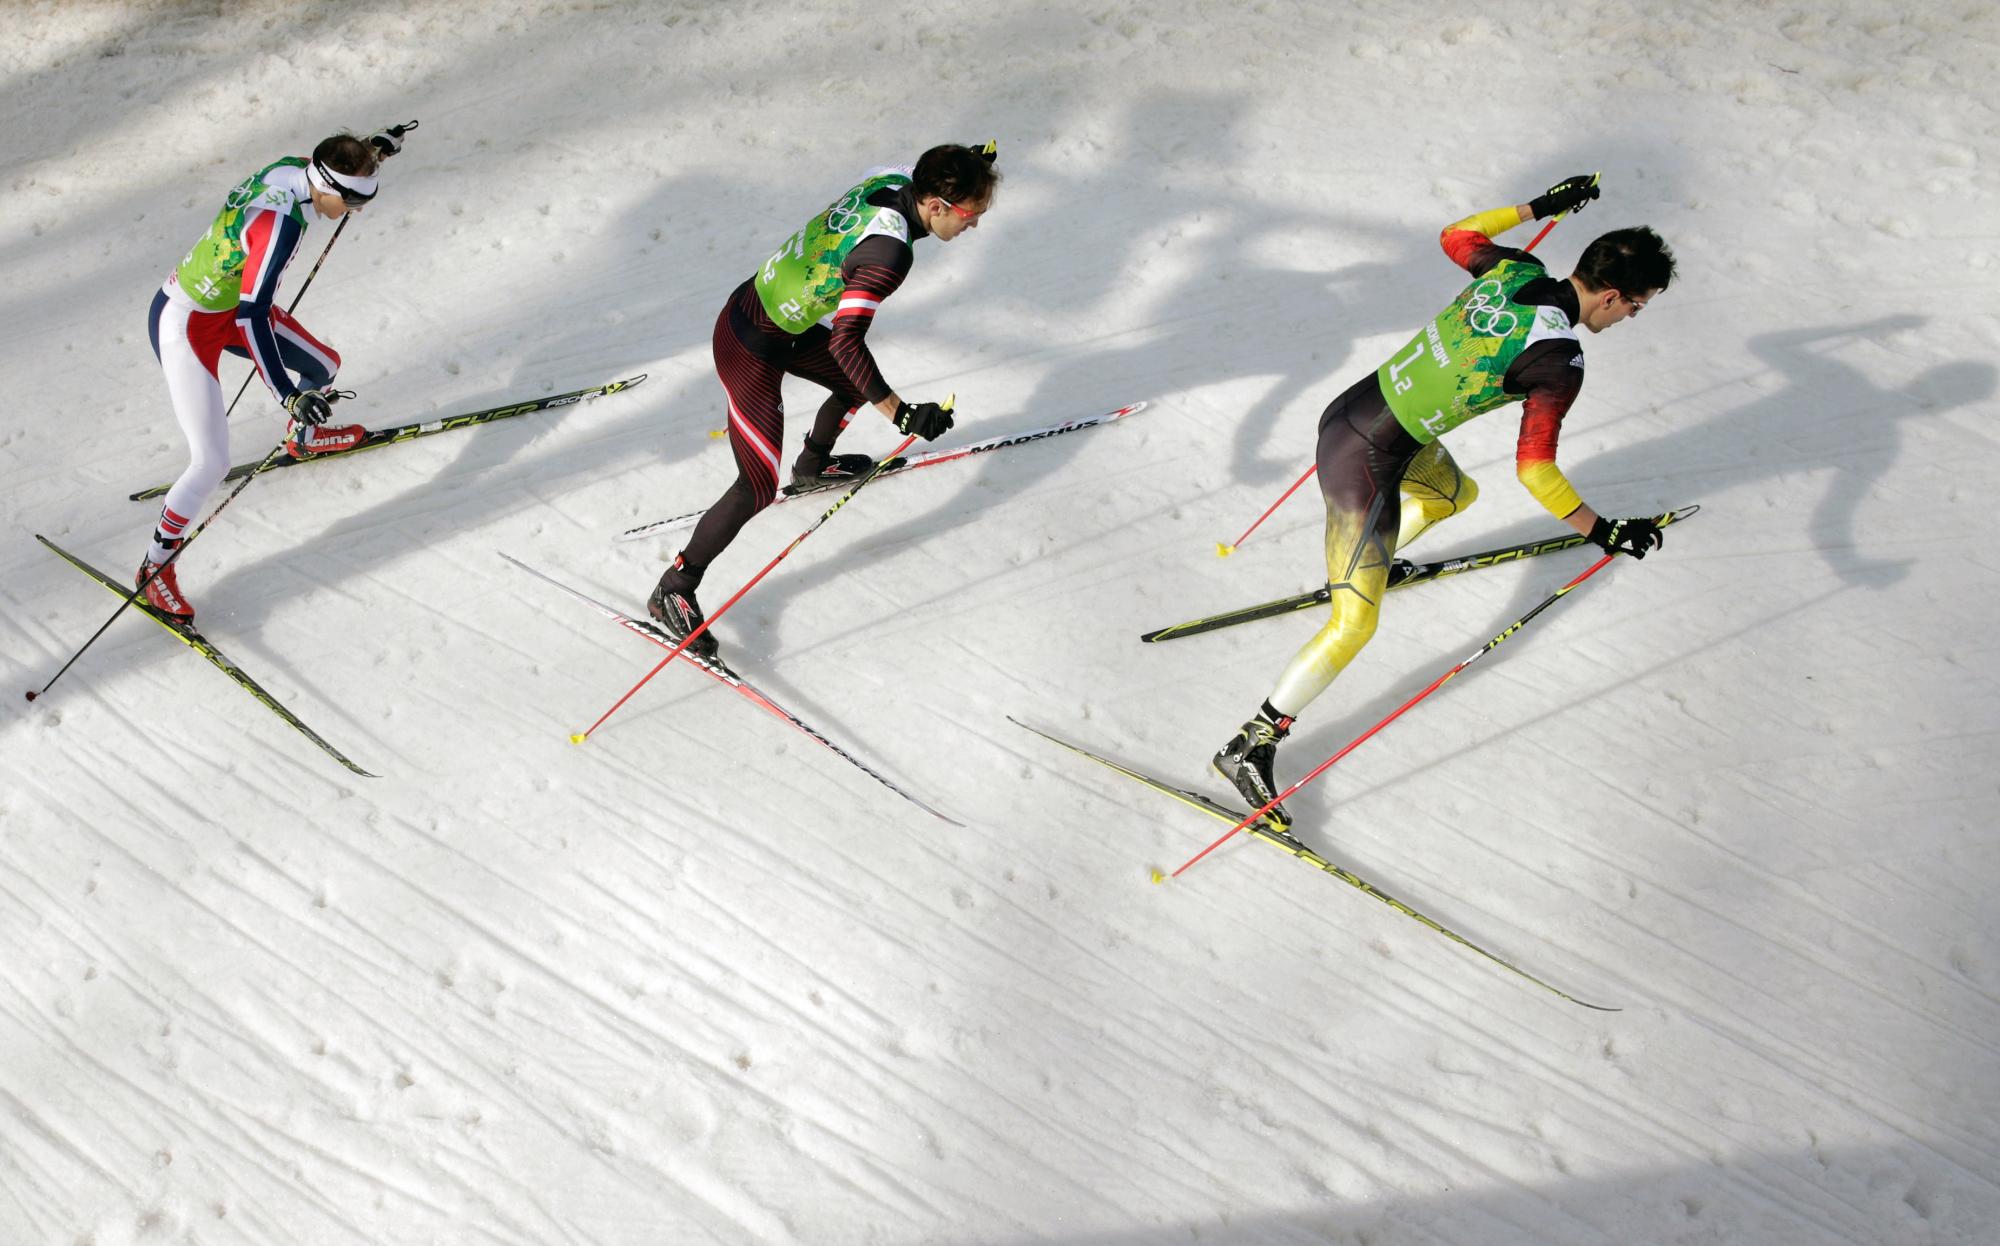 Haavard Klemetsen of Norway, Christoph Bieler of Austria and Bjoern Kircheisen of Germany compete in the Nordic Combined Men's Team 4 x 5 km.